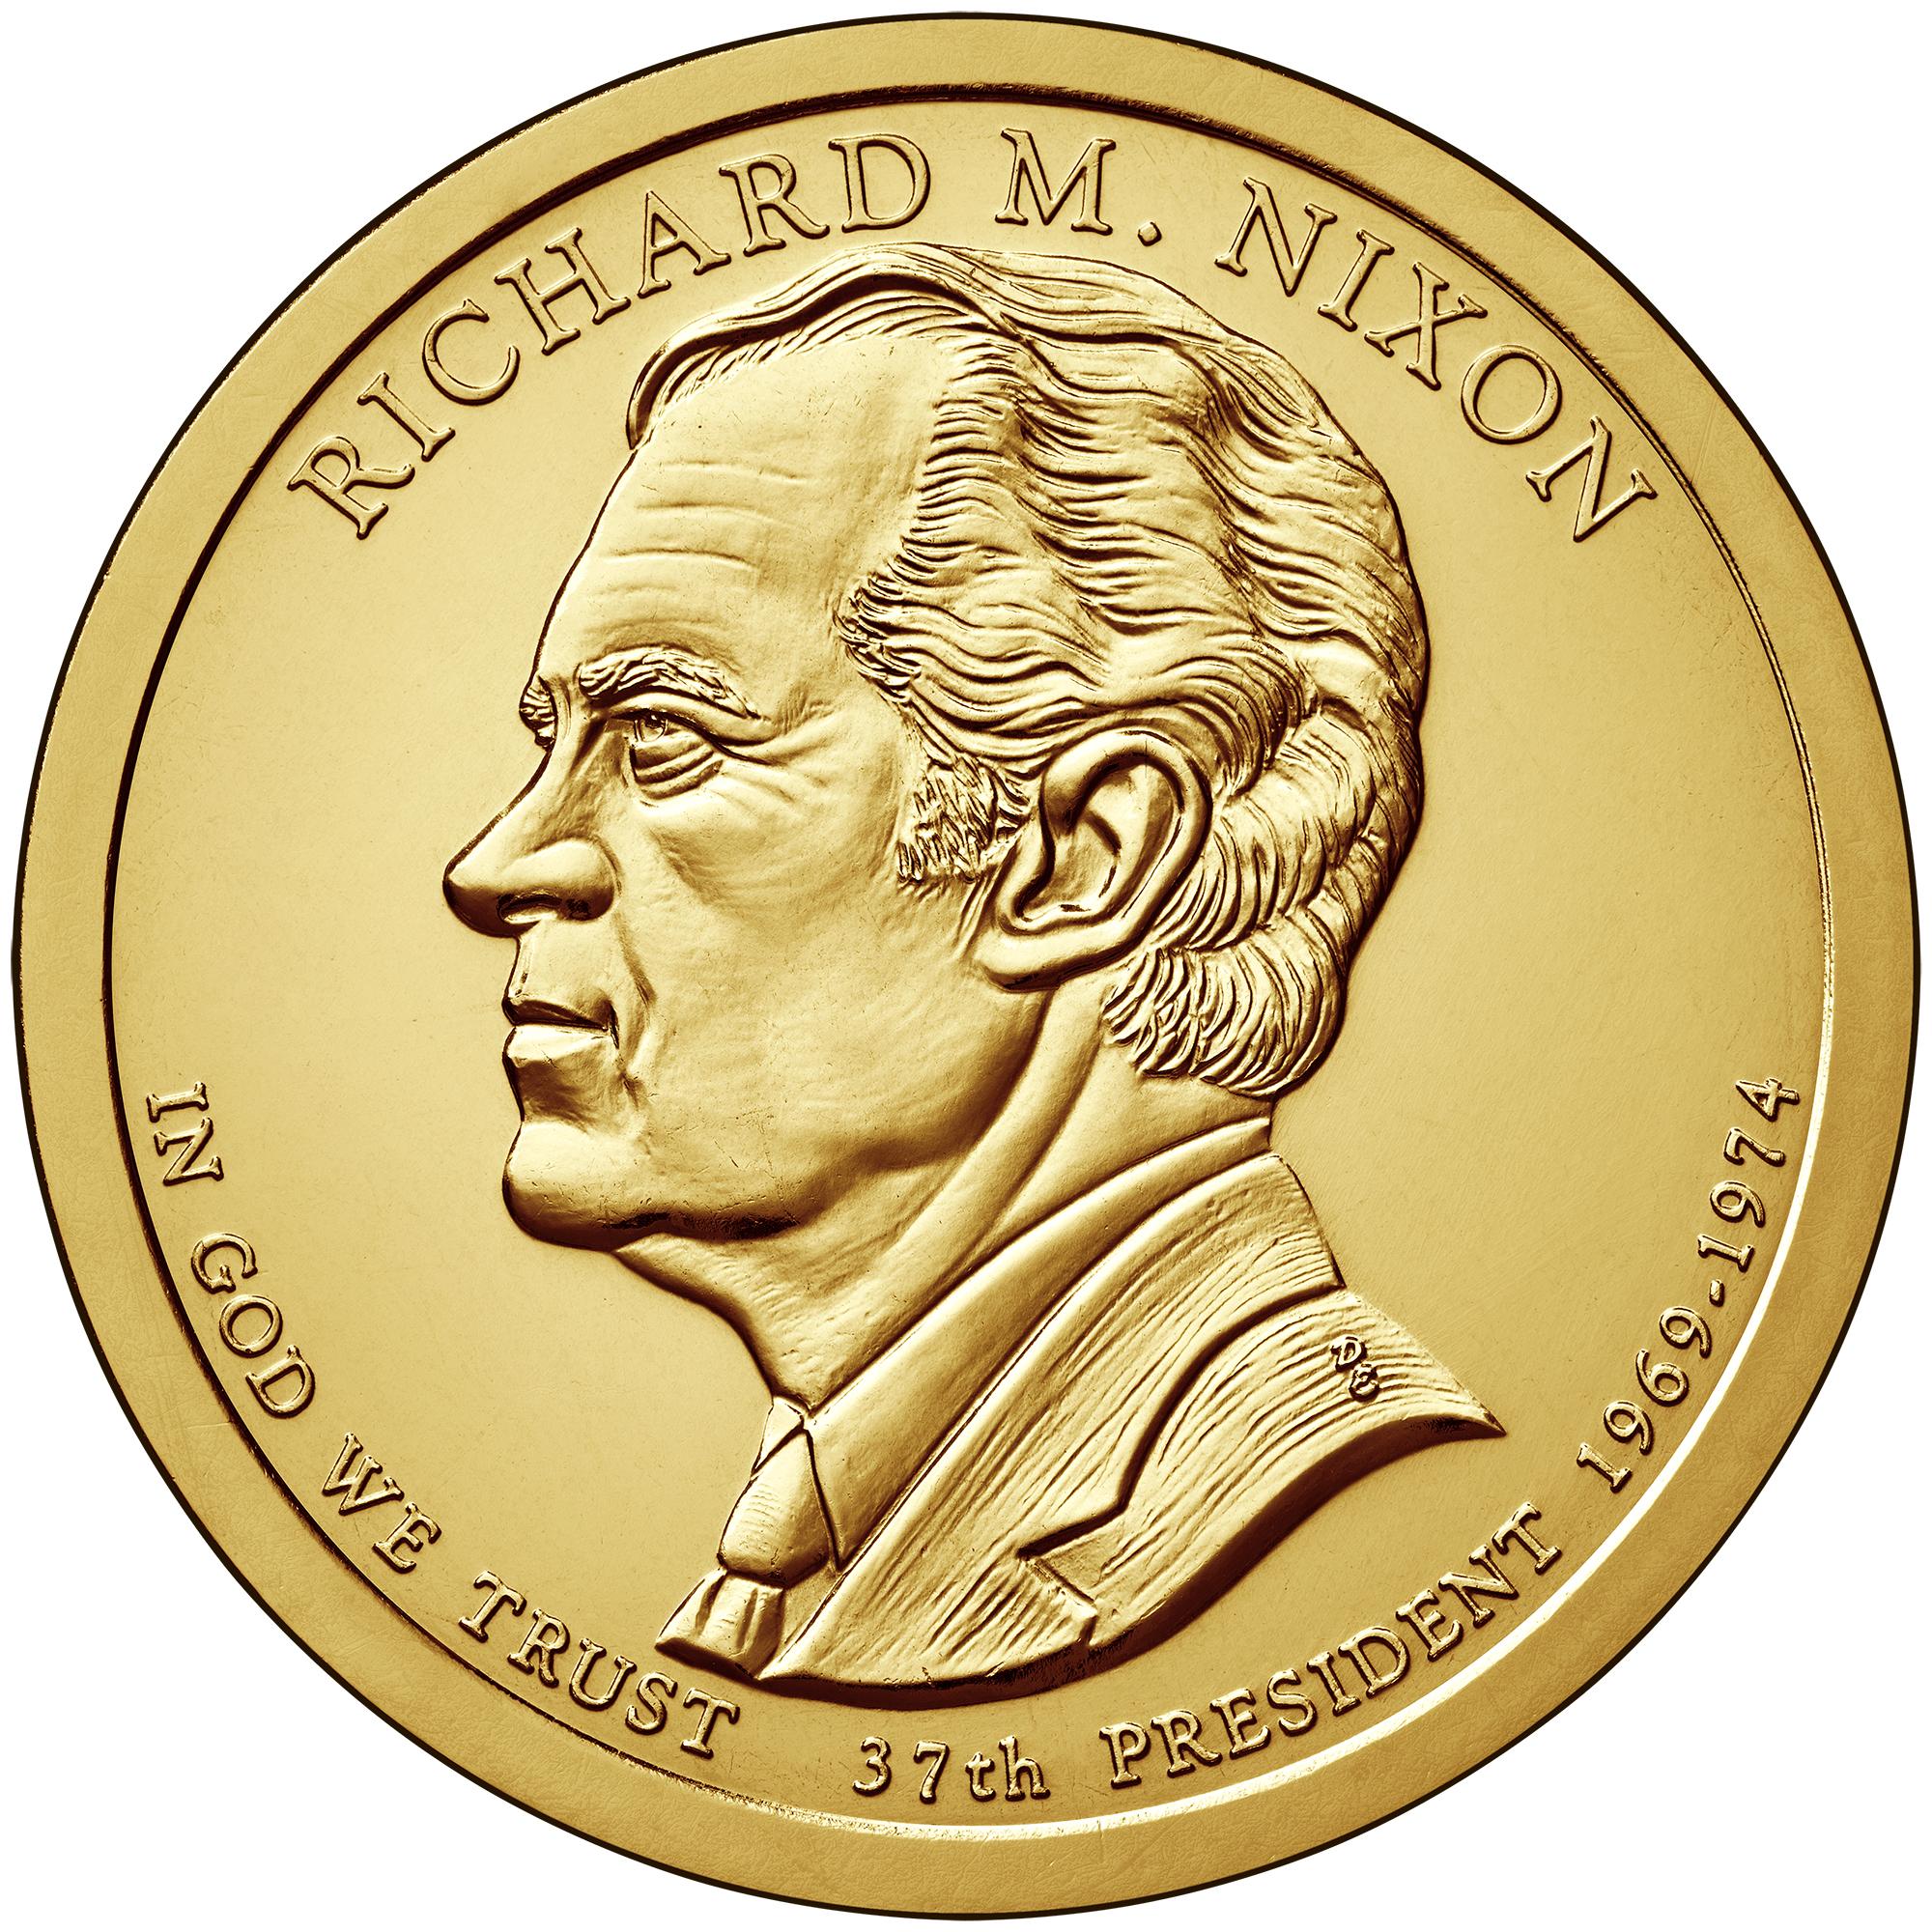 2016 S, P, P, D, D Nixon $1 Golden Dollar 5-coin Set